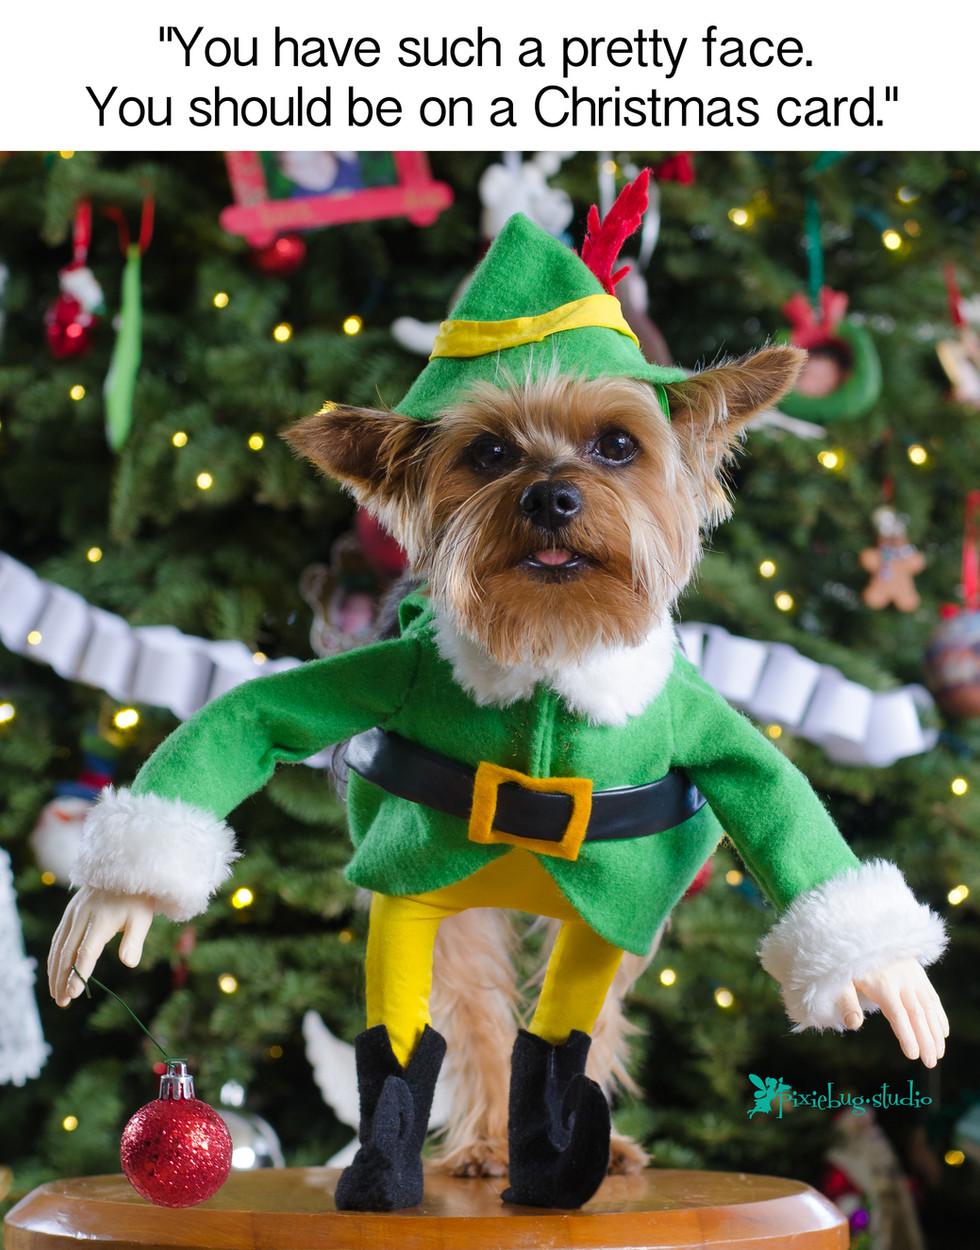 Jack the Elf from Pixiebug Studio